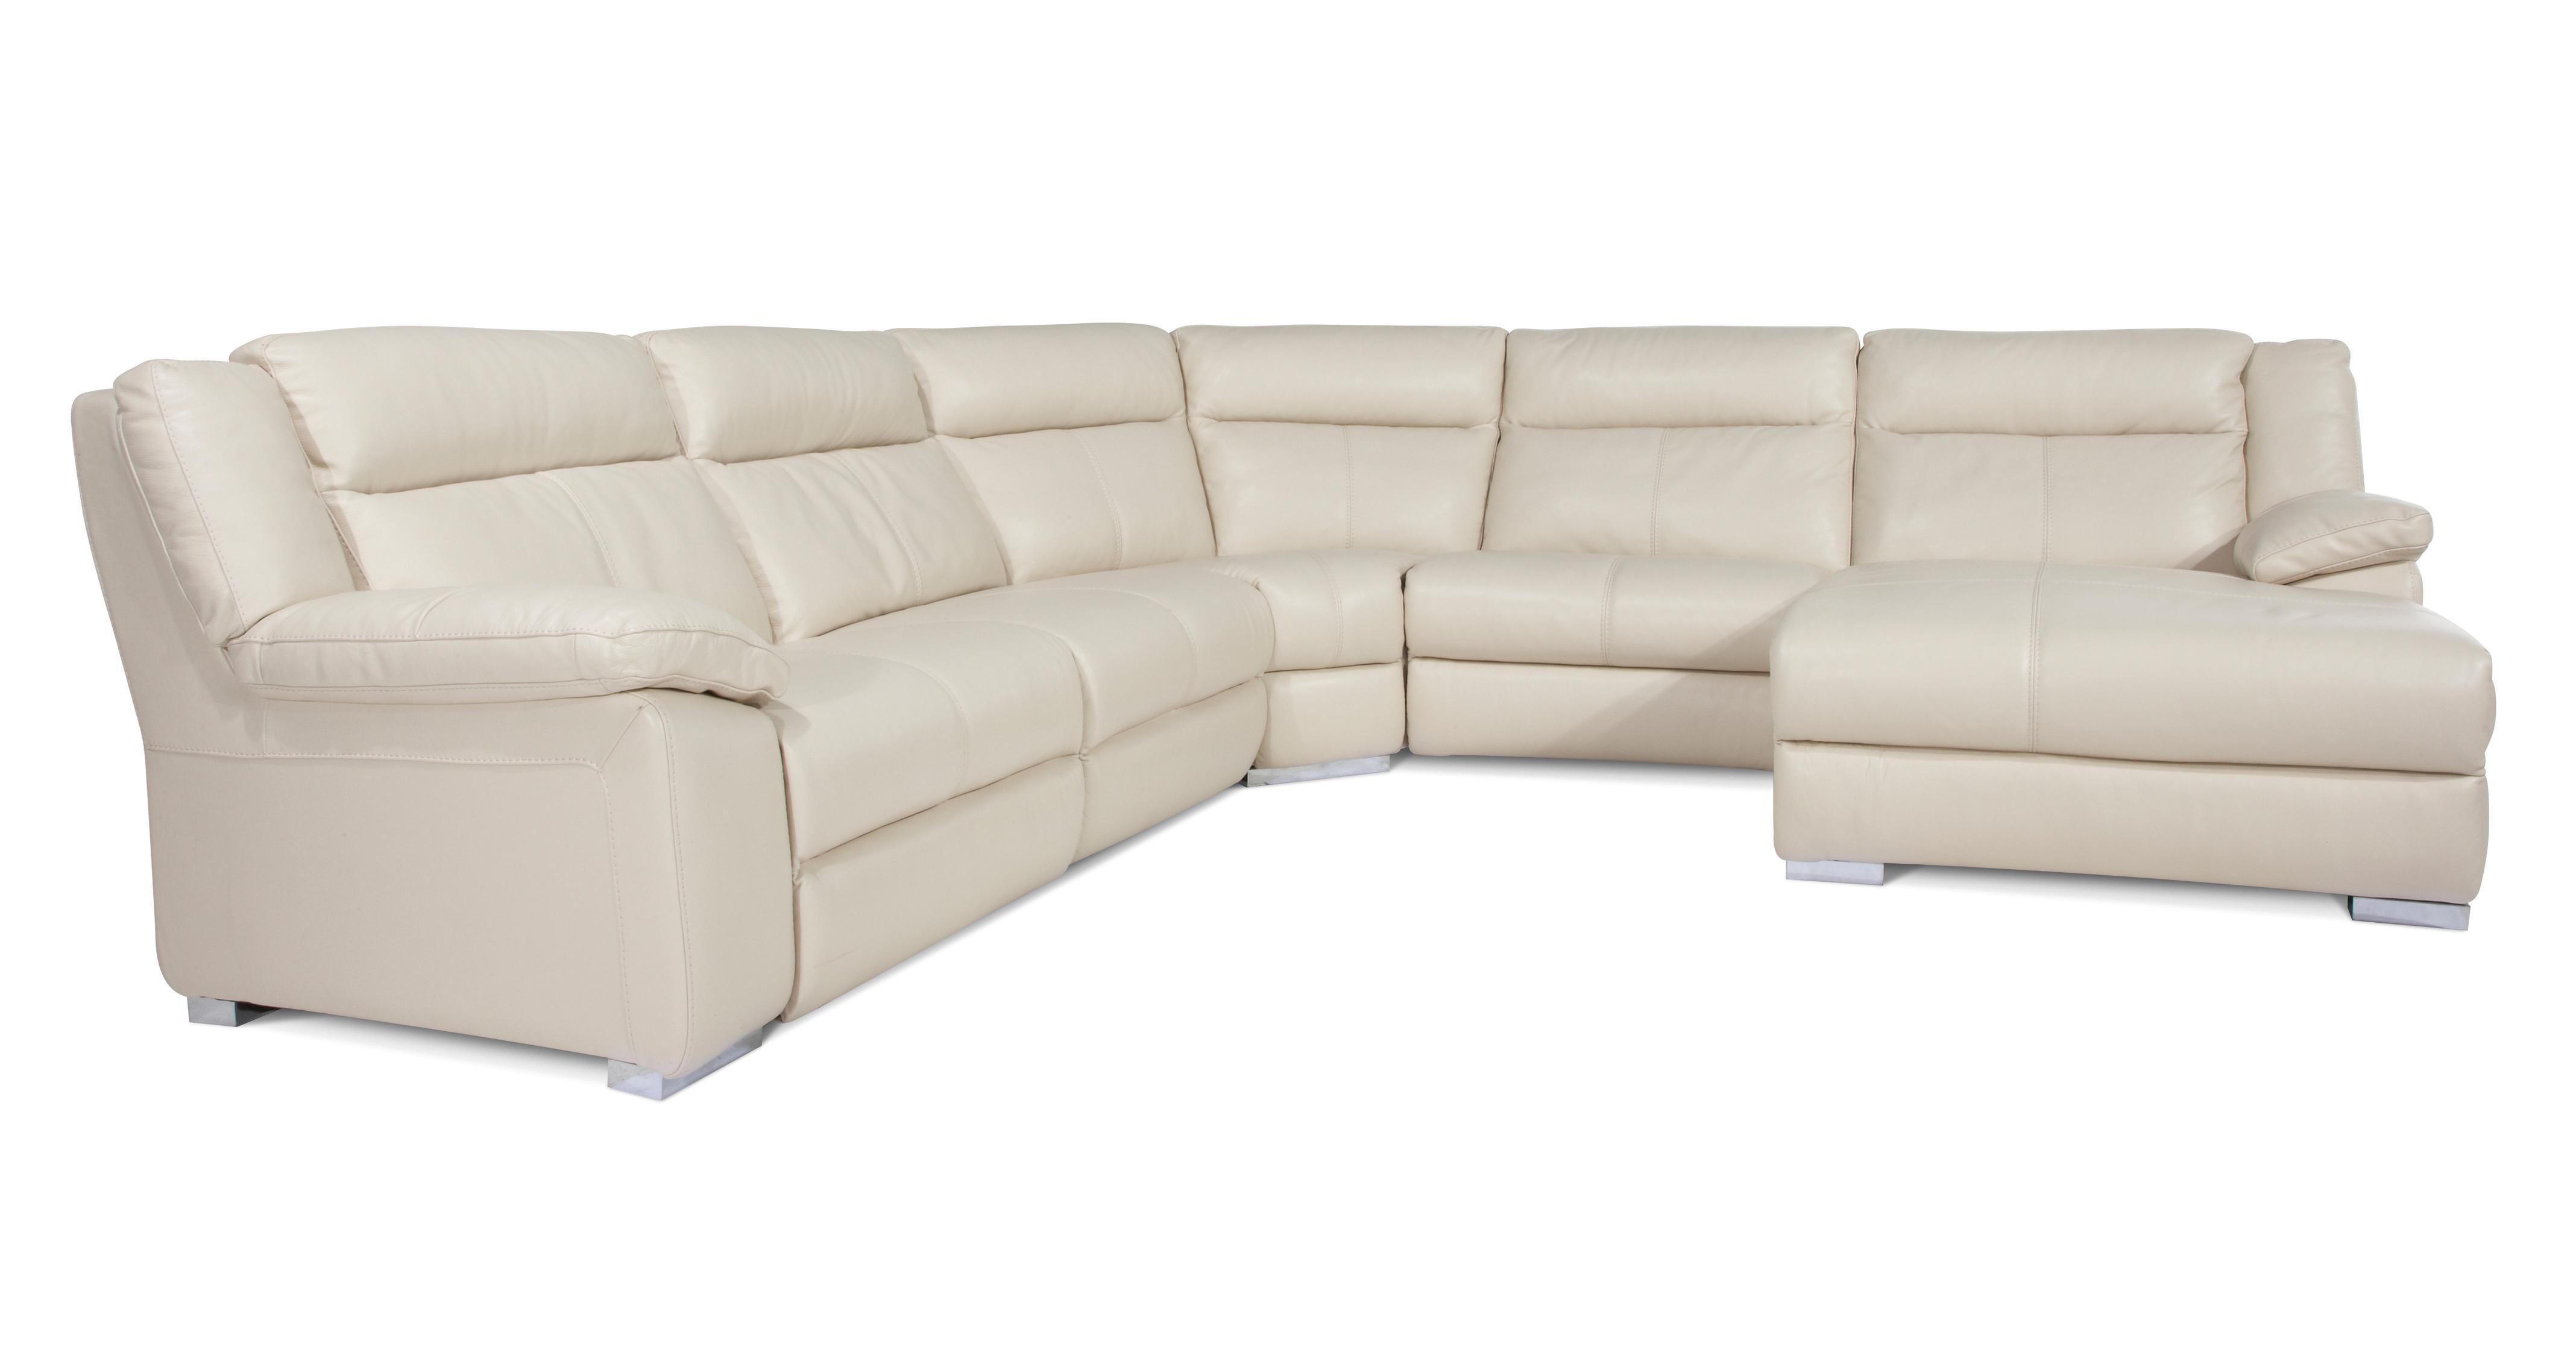 Surprising Swift Right Hand Facing Chaise Power Corner Sofa New Club Inzonedesignstudio Interior Chair Design Inzonedesignstudiocom